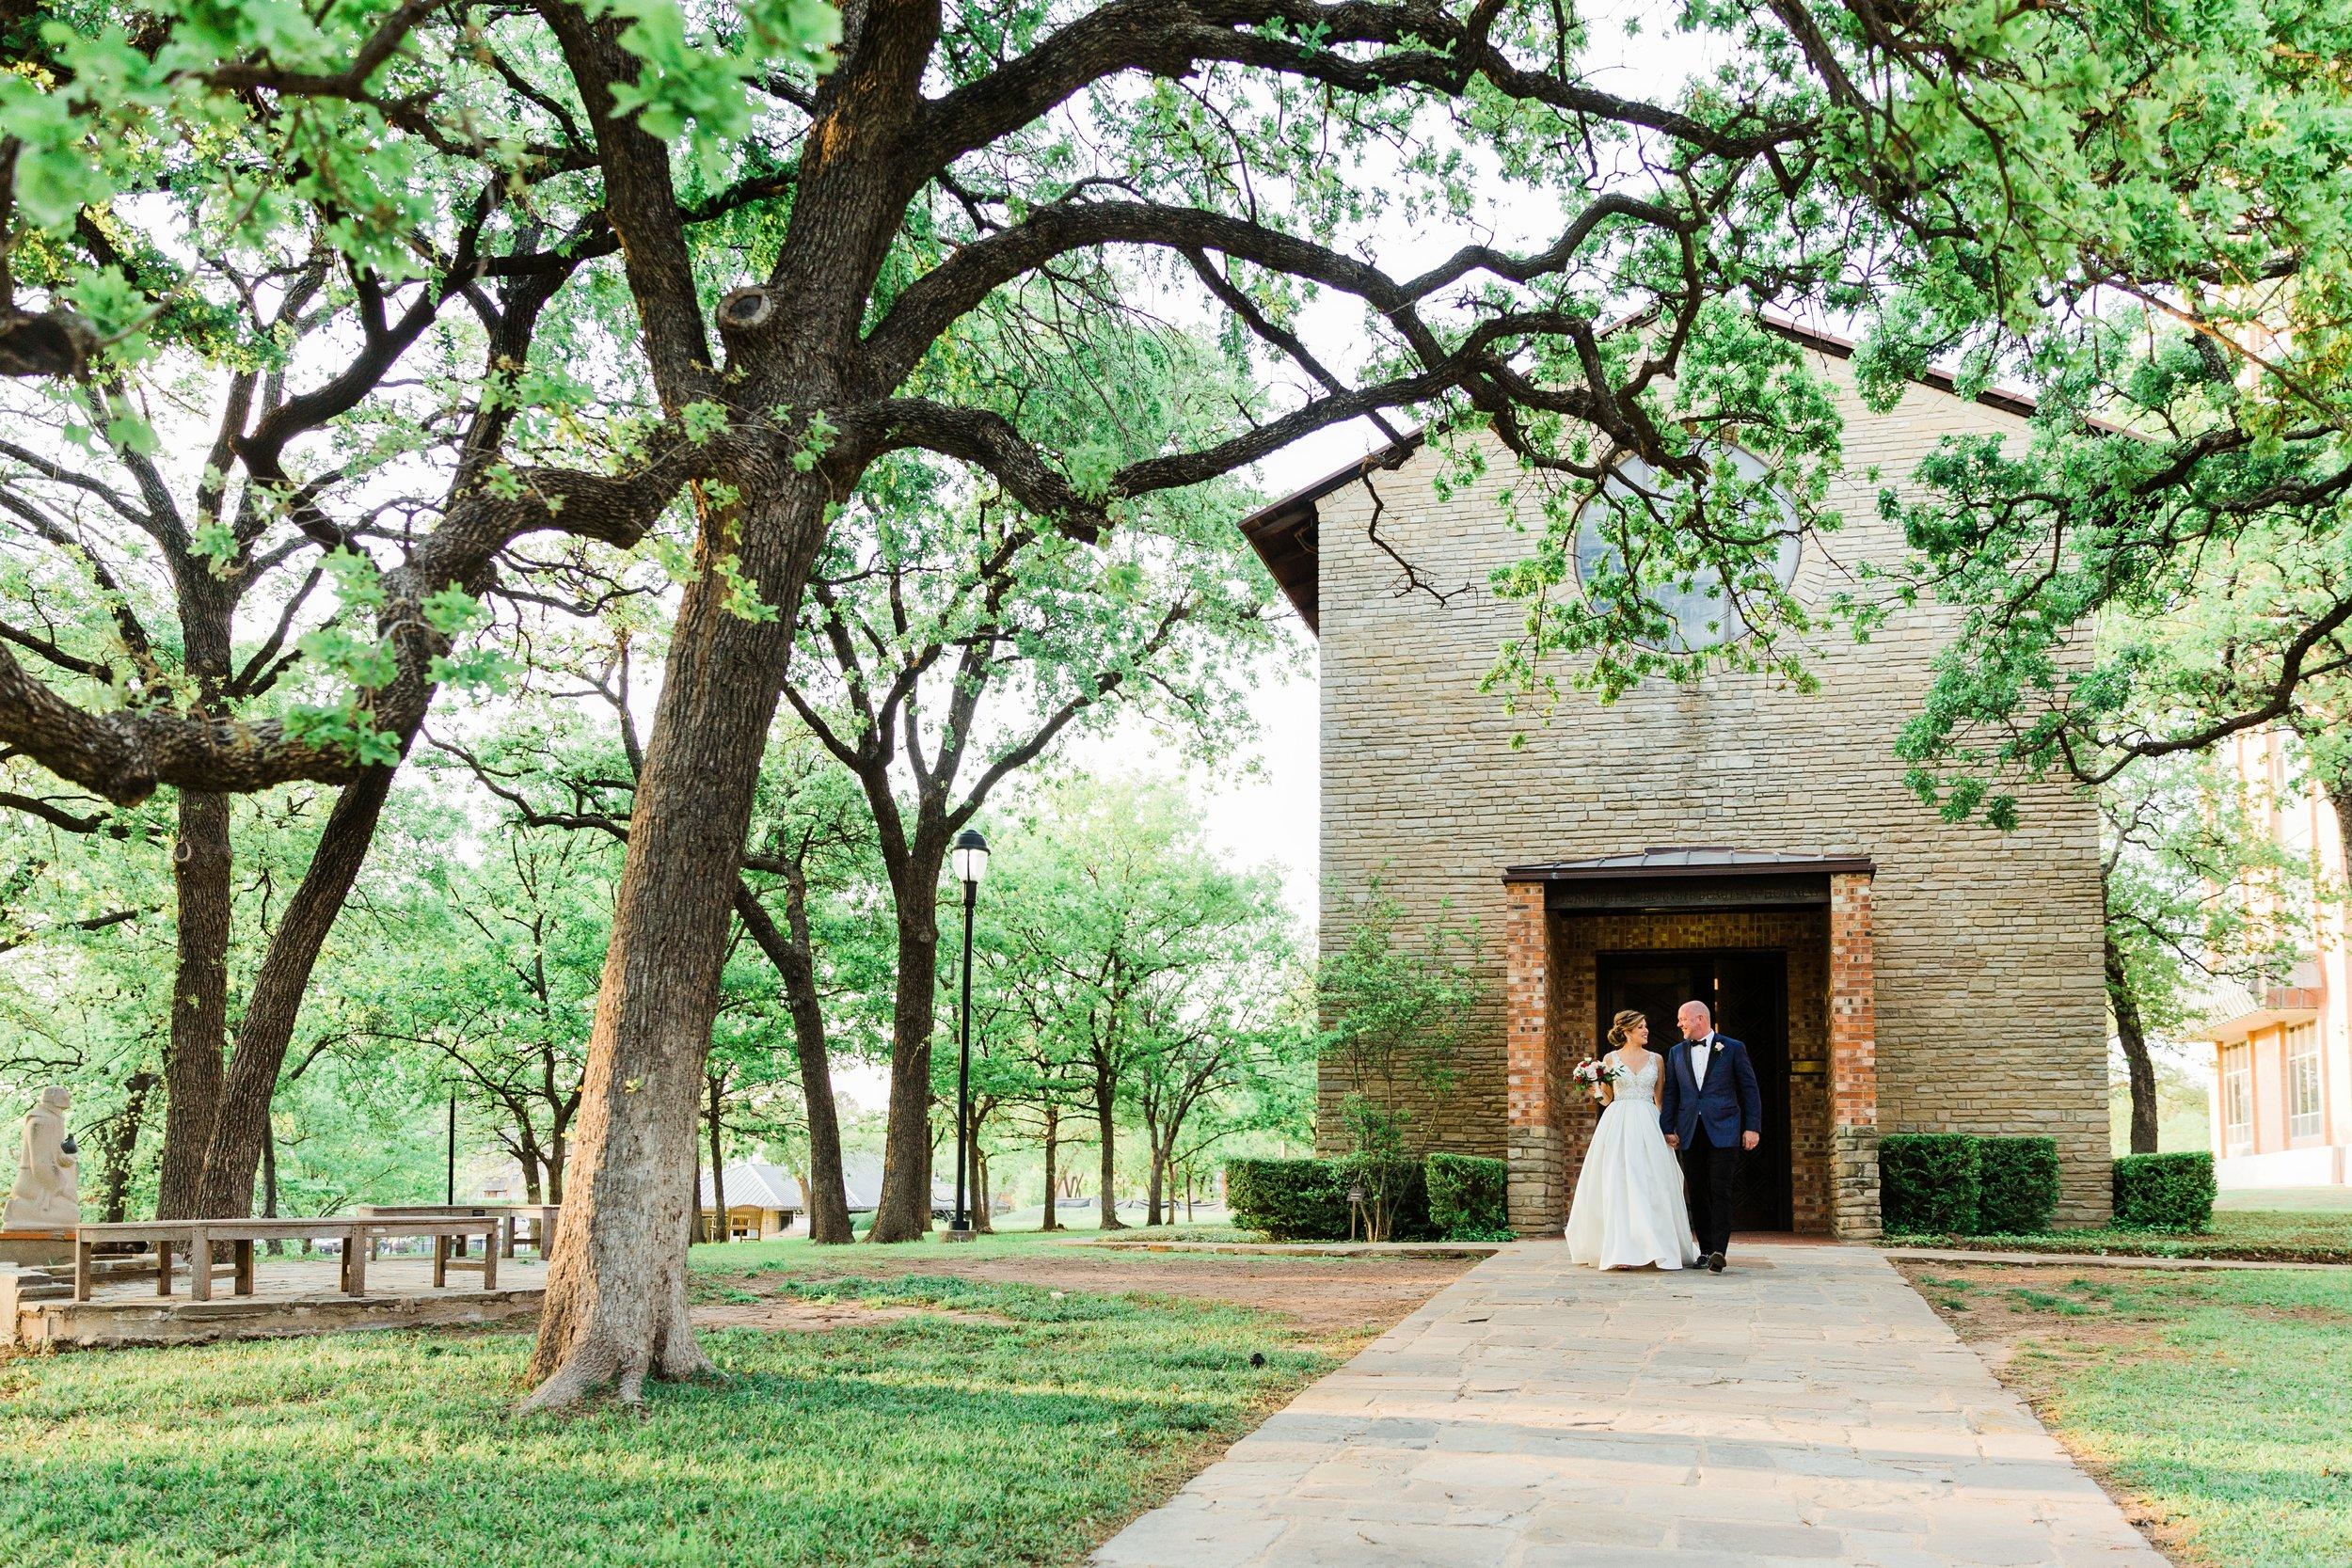 haehn-wedding-little-chapel-in-the-woods-denton-tx-lantana-golf-club-wedding-039.jpg